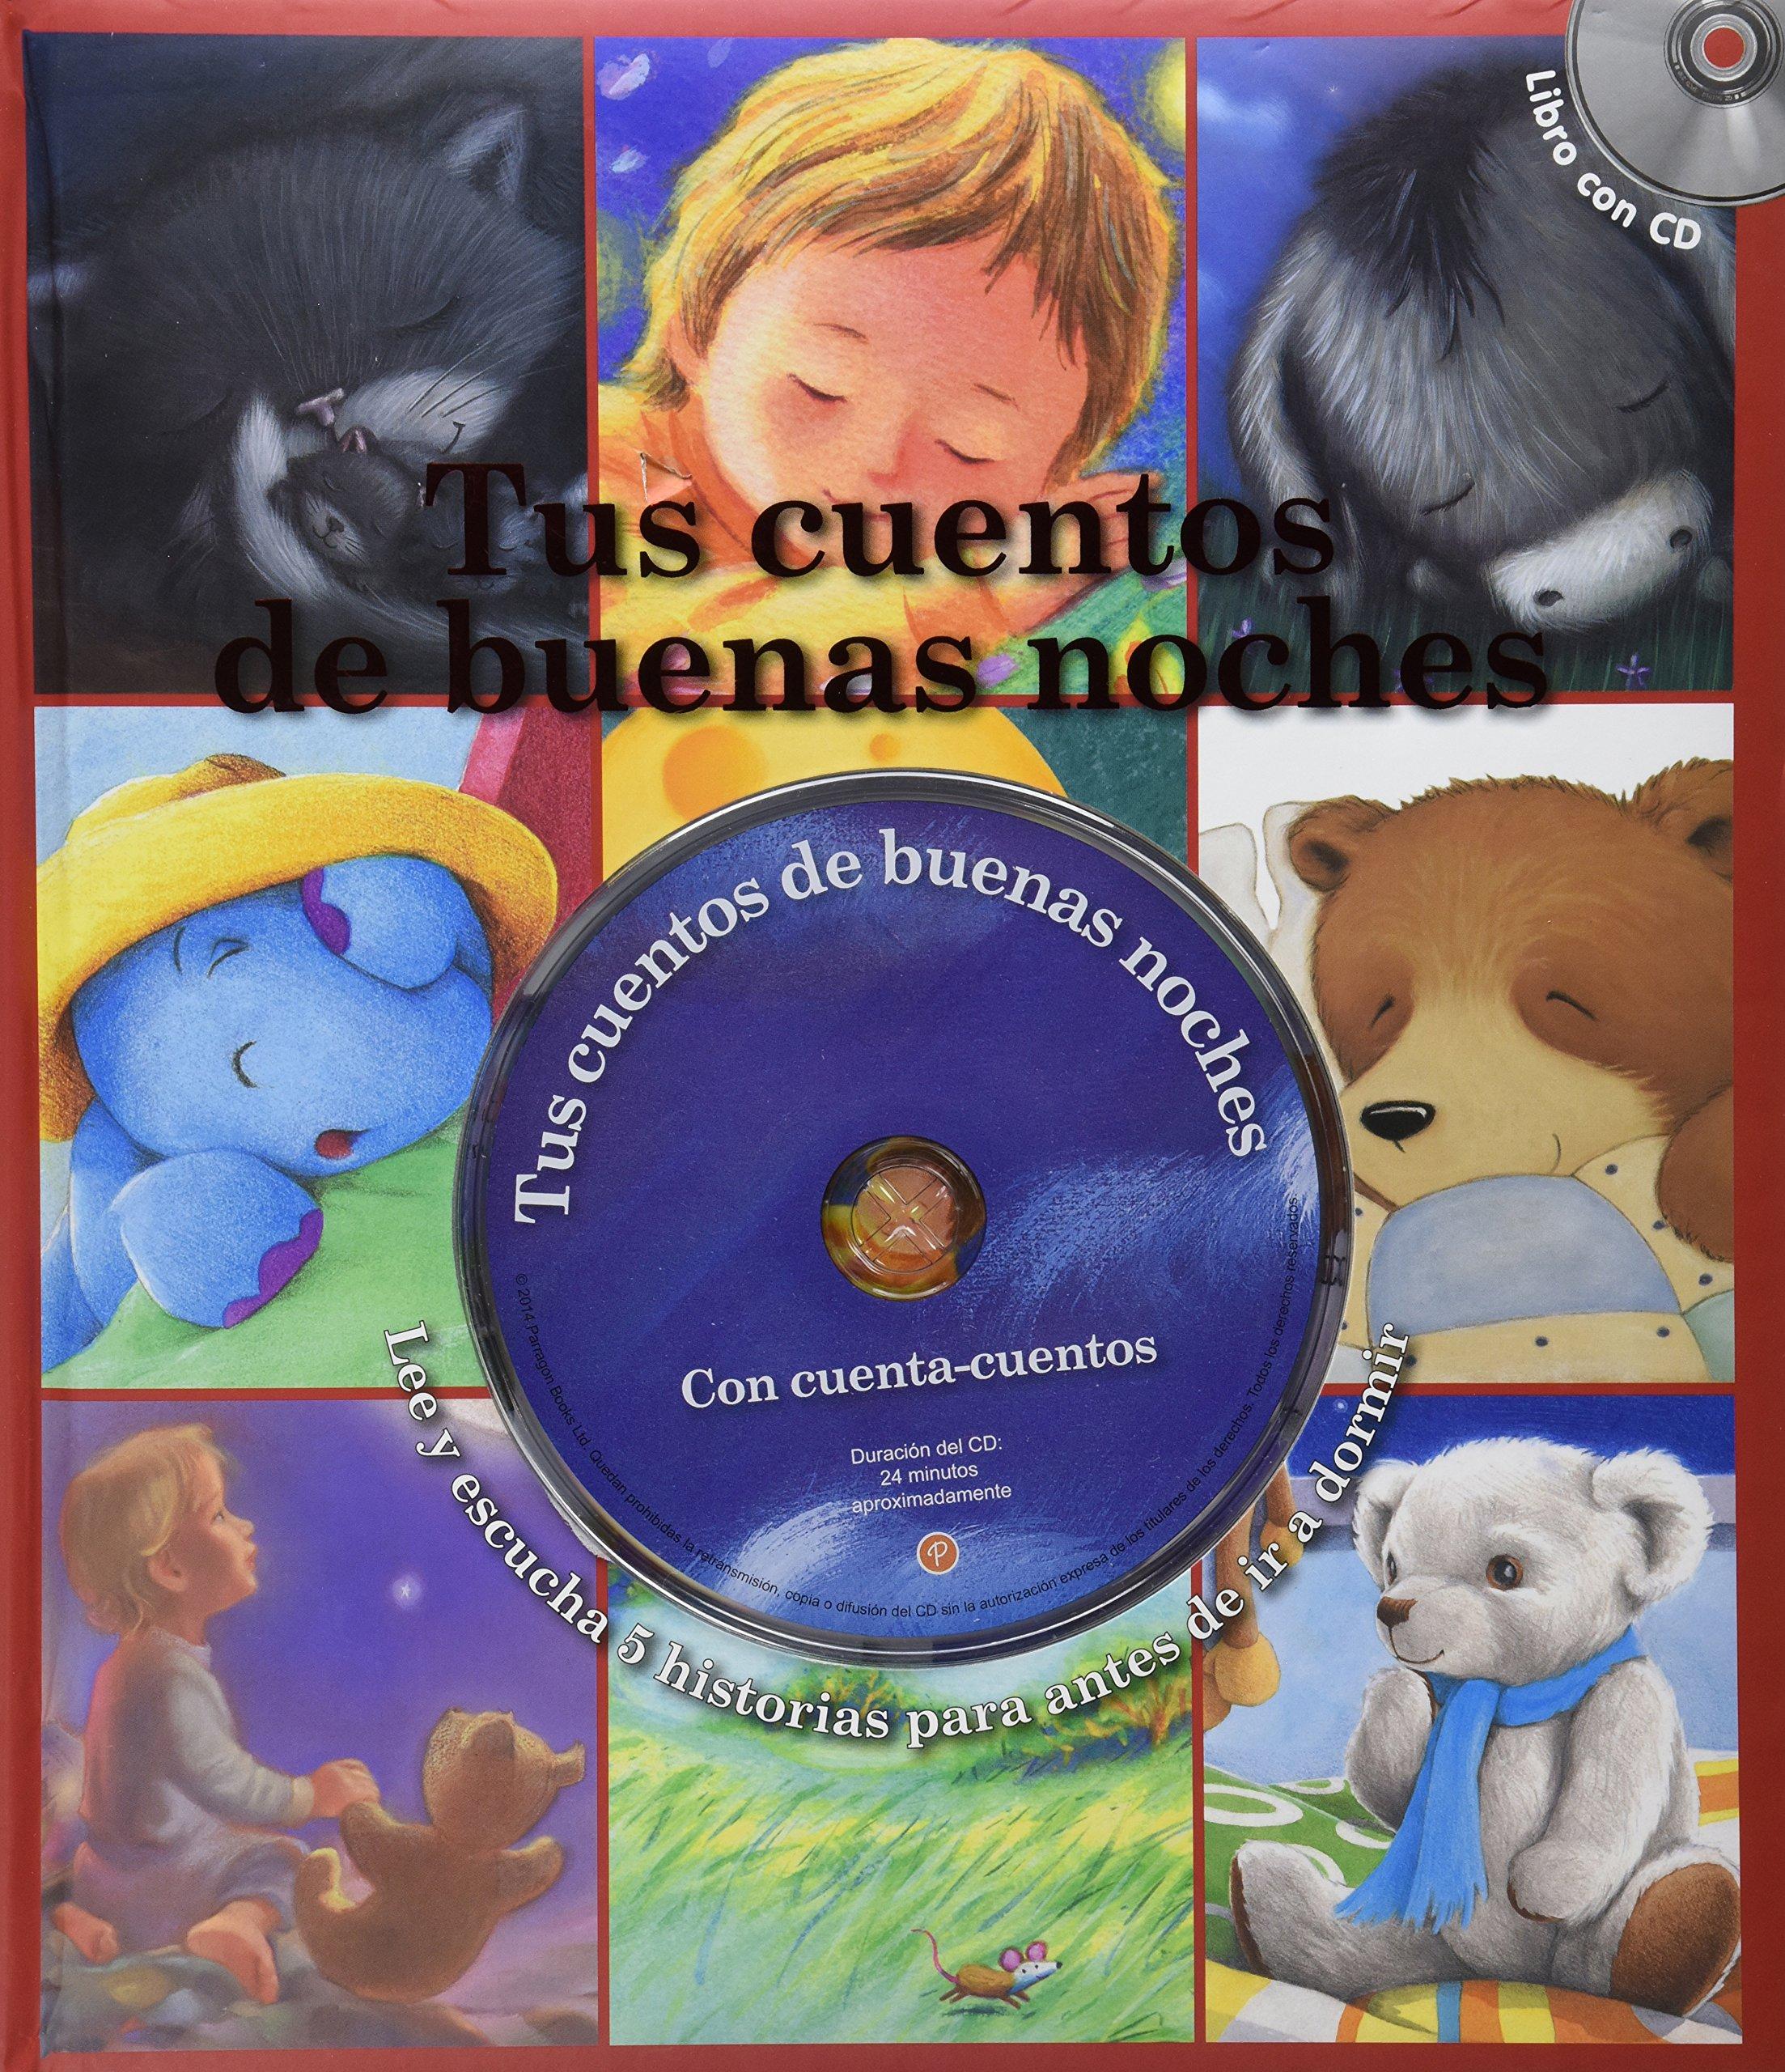 Tus cuentos de buenas noches (Spanish Edition) (Spanish) Hardcover –  January 1, 2014